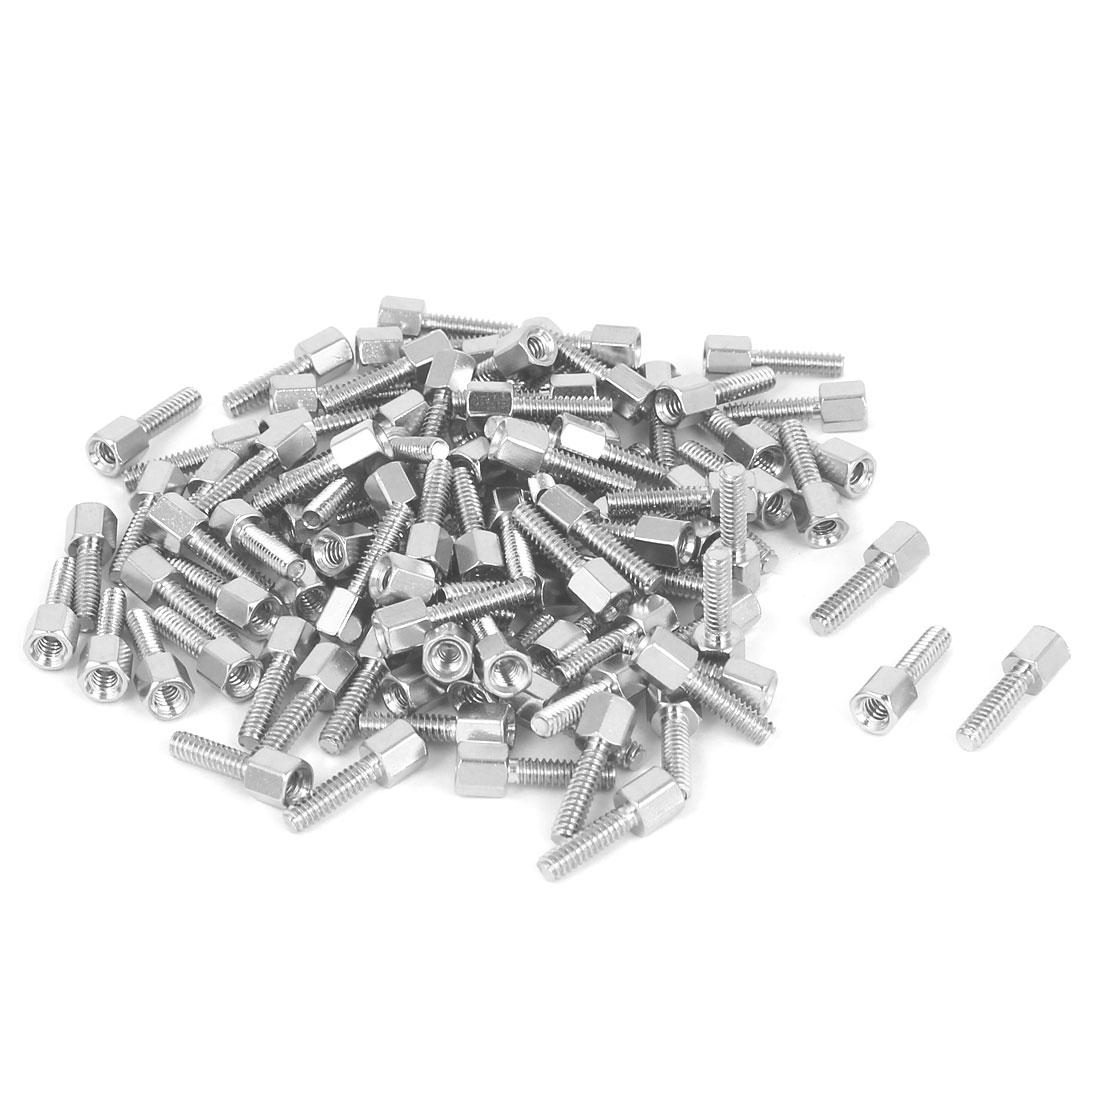 M3x5mm+10mm Male to Female Thread Brass Spacer Hexagonal Standoff Pillar 500pcs